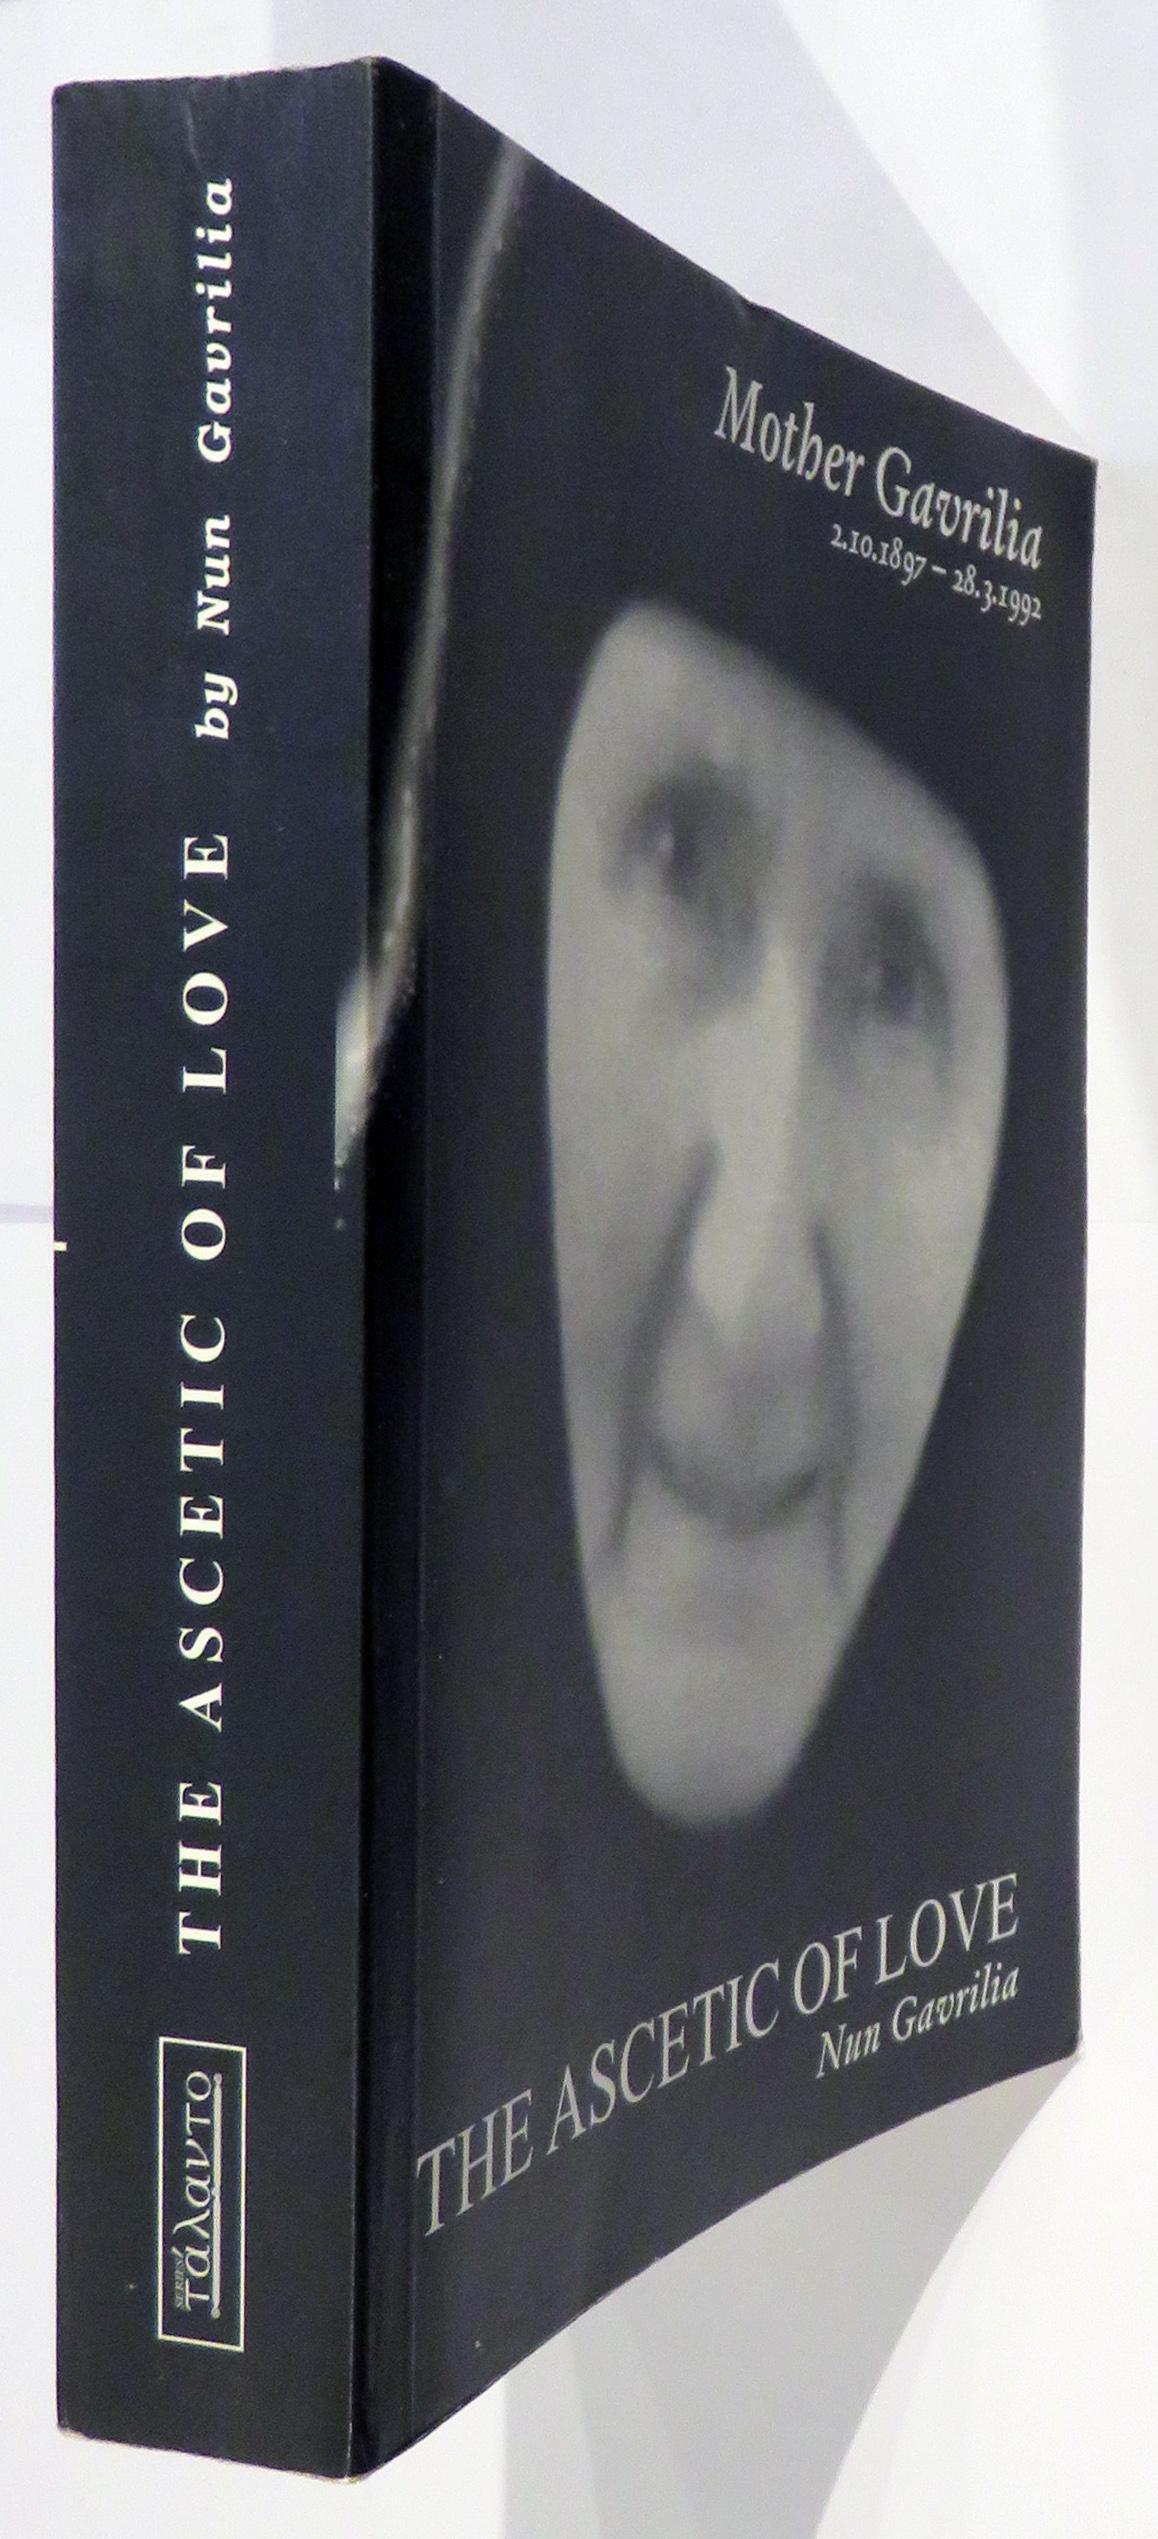 Mother Gavrilia The Ascetic of Love